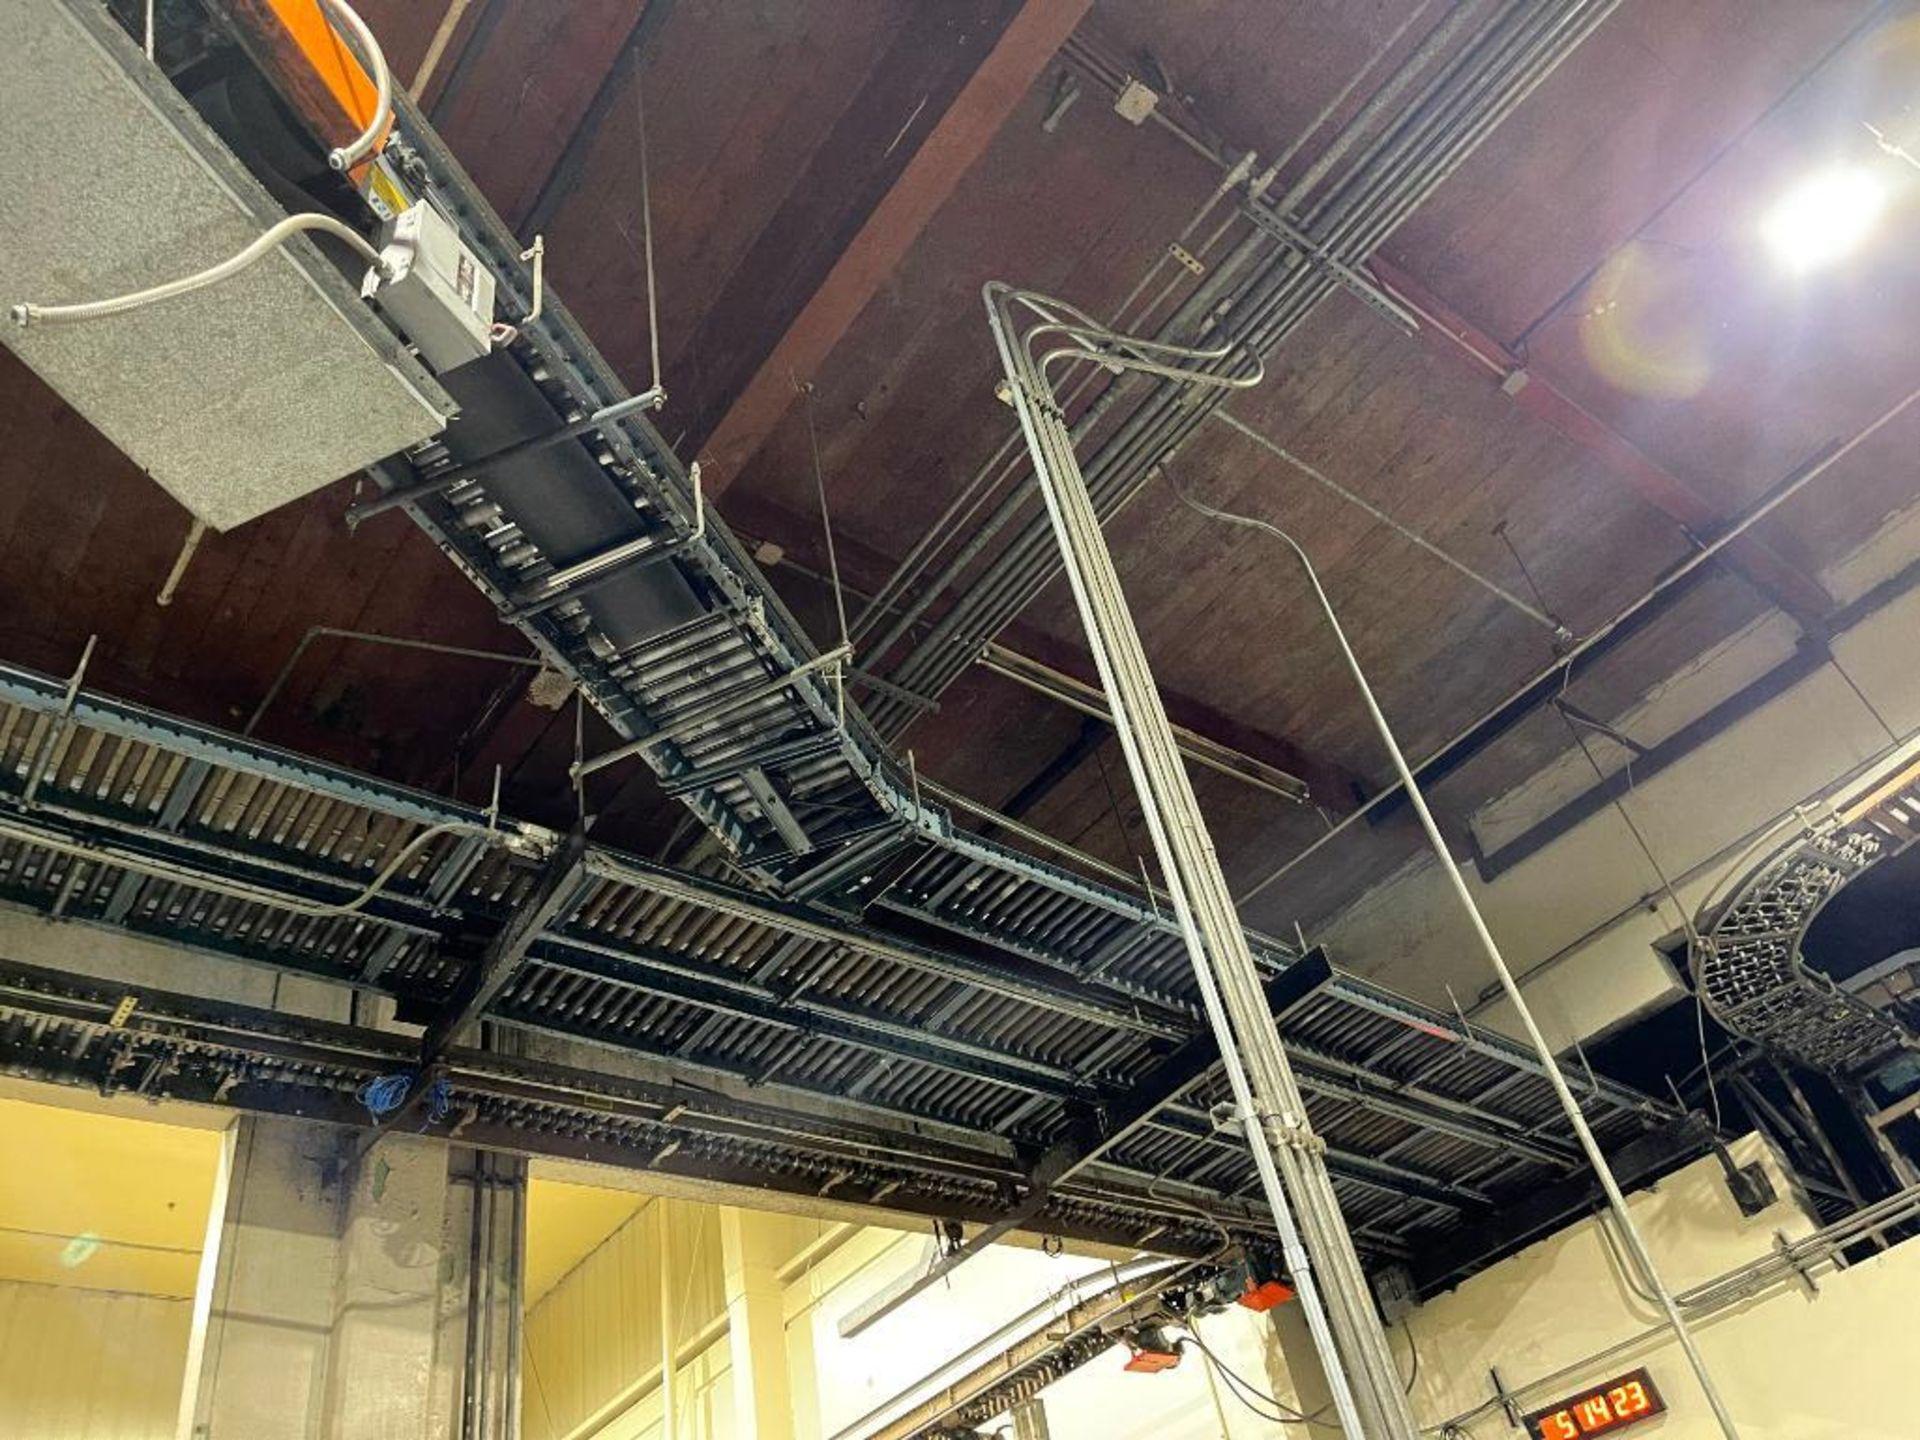 overhead power case conveyor - Image 5 of 9